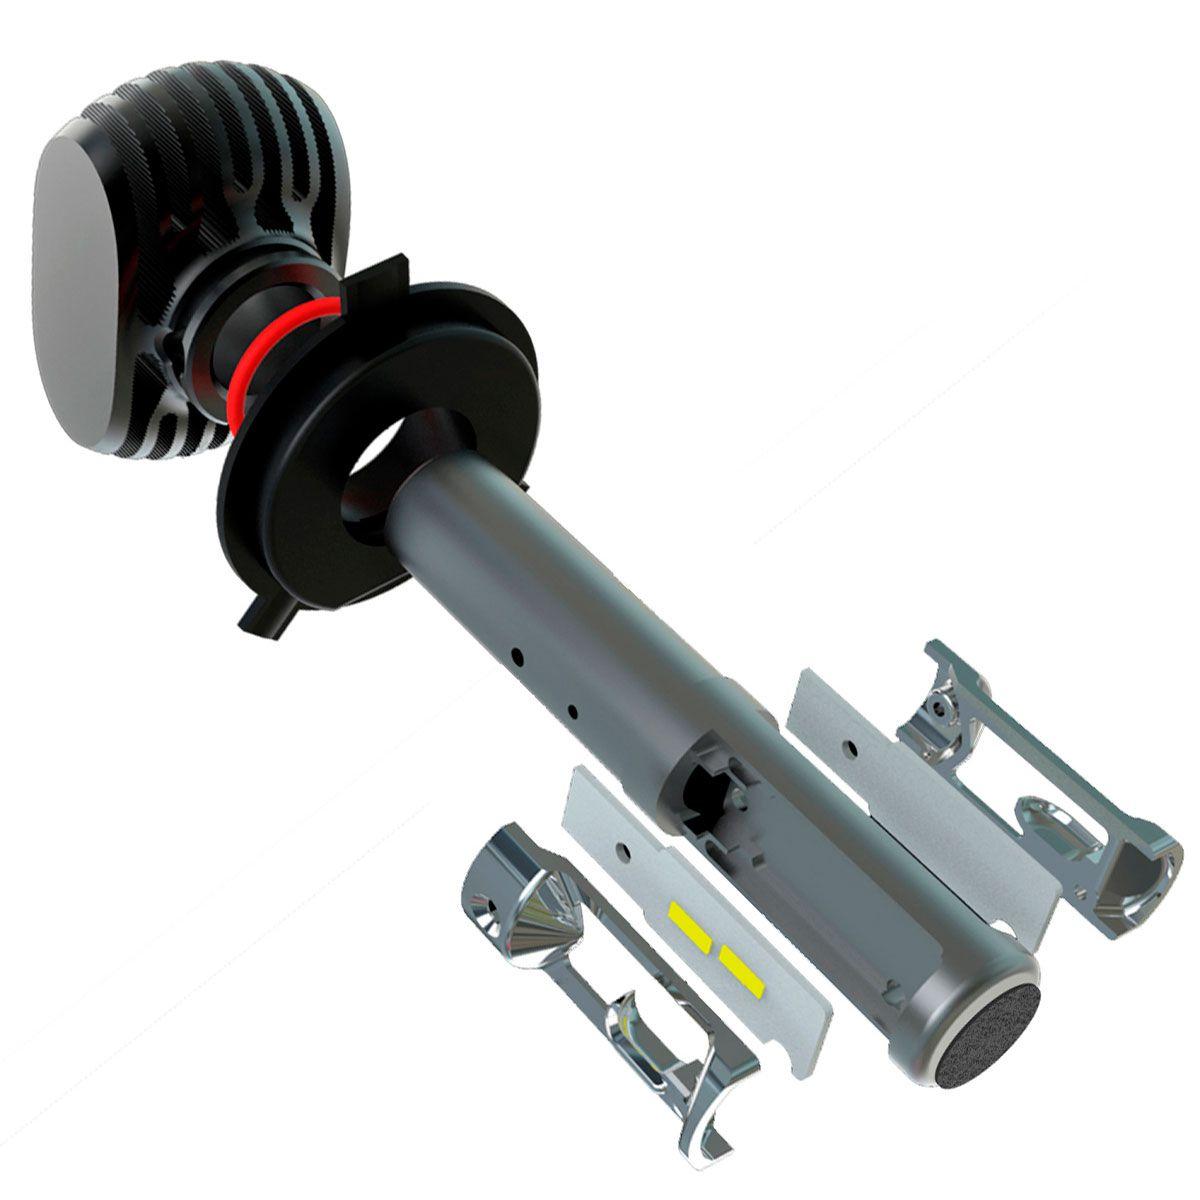 Kit Ultra LED Gol G5 2008 2009 2010 2011 2012 tipo xenon farol de milha HB4 50W